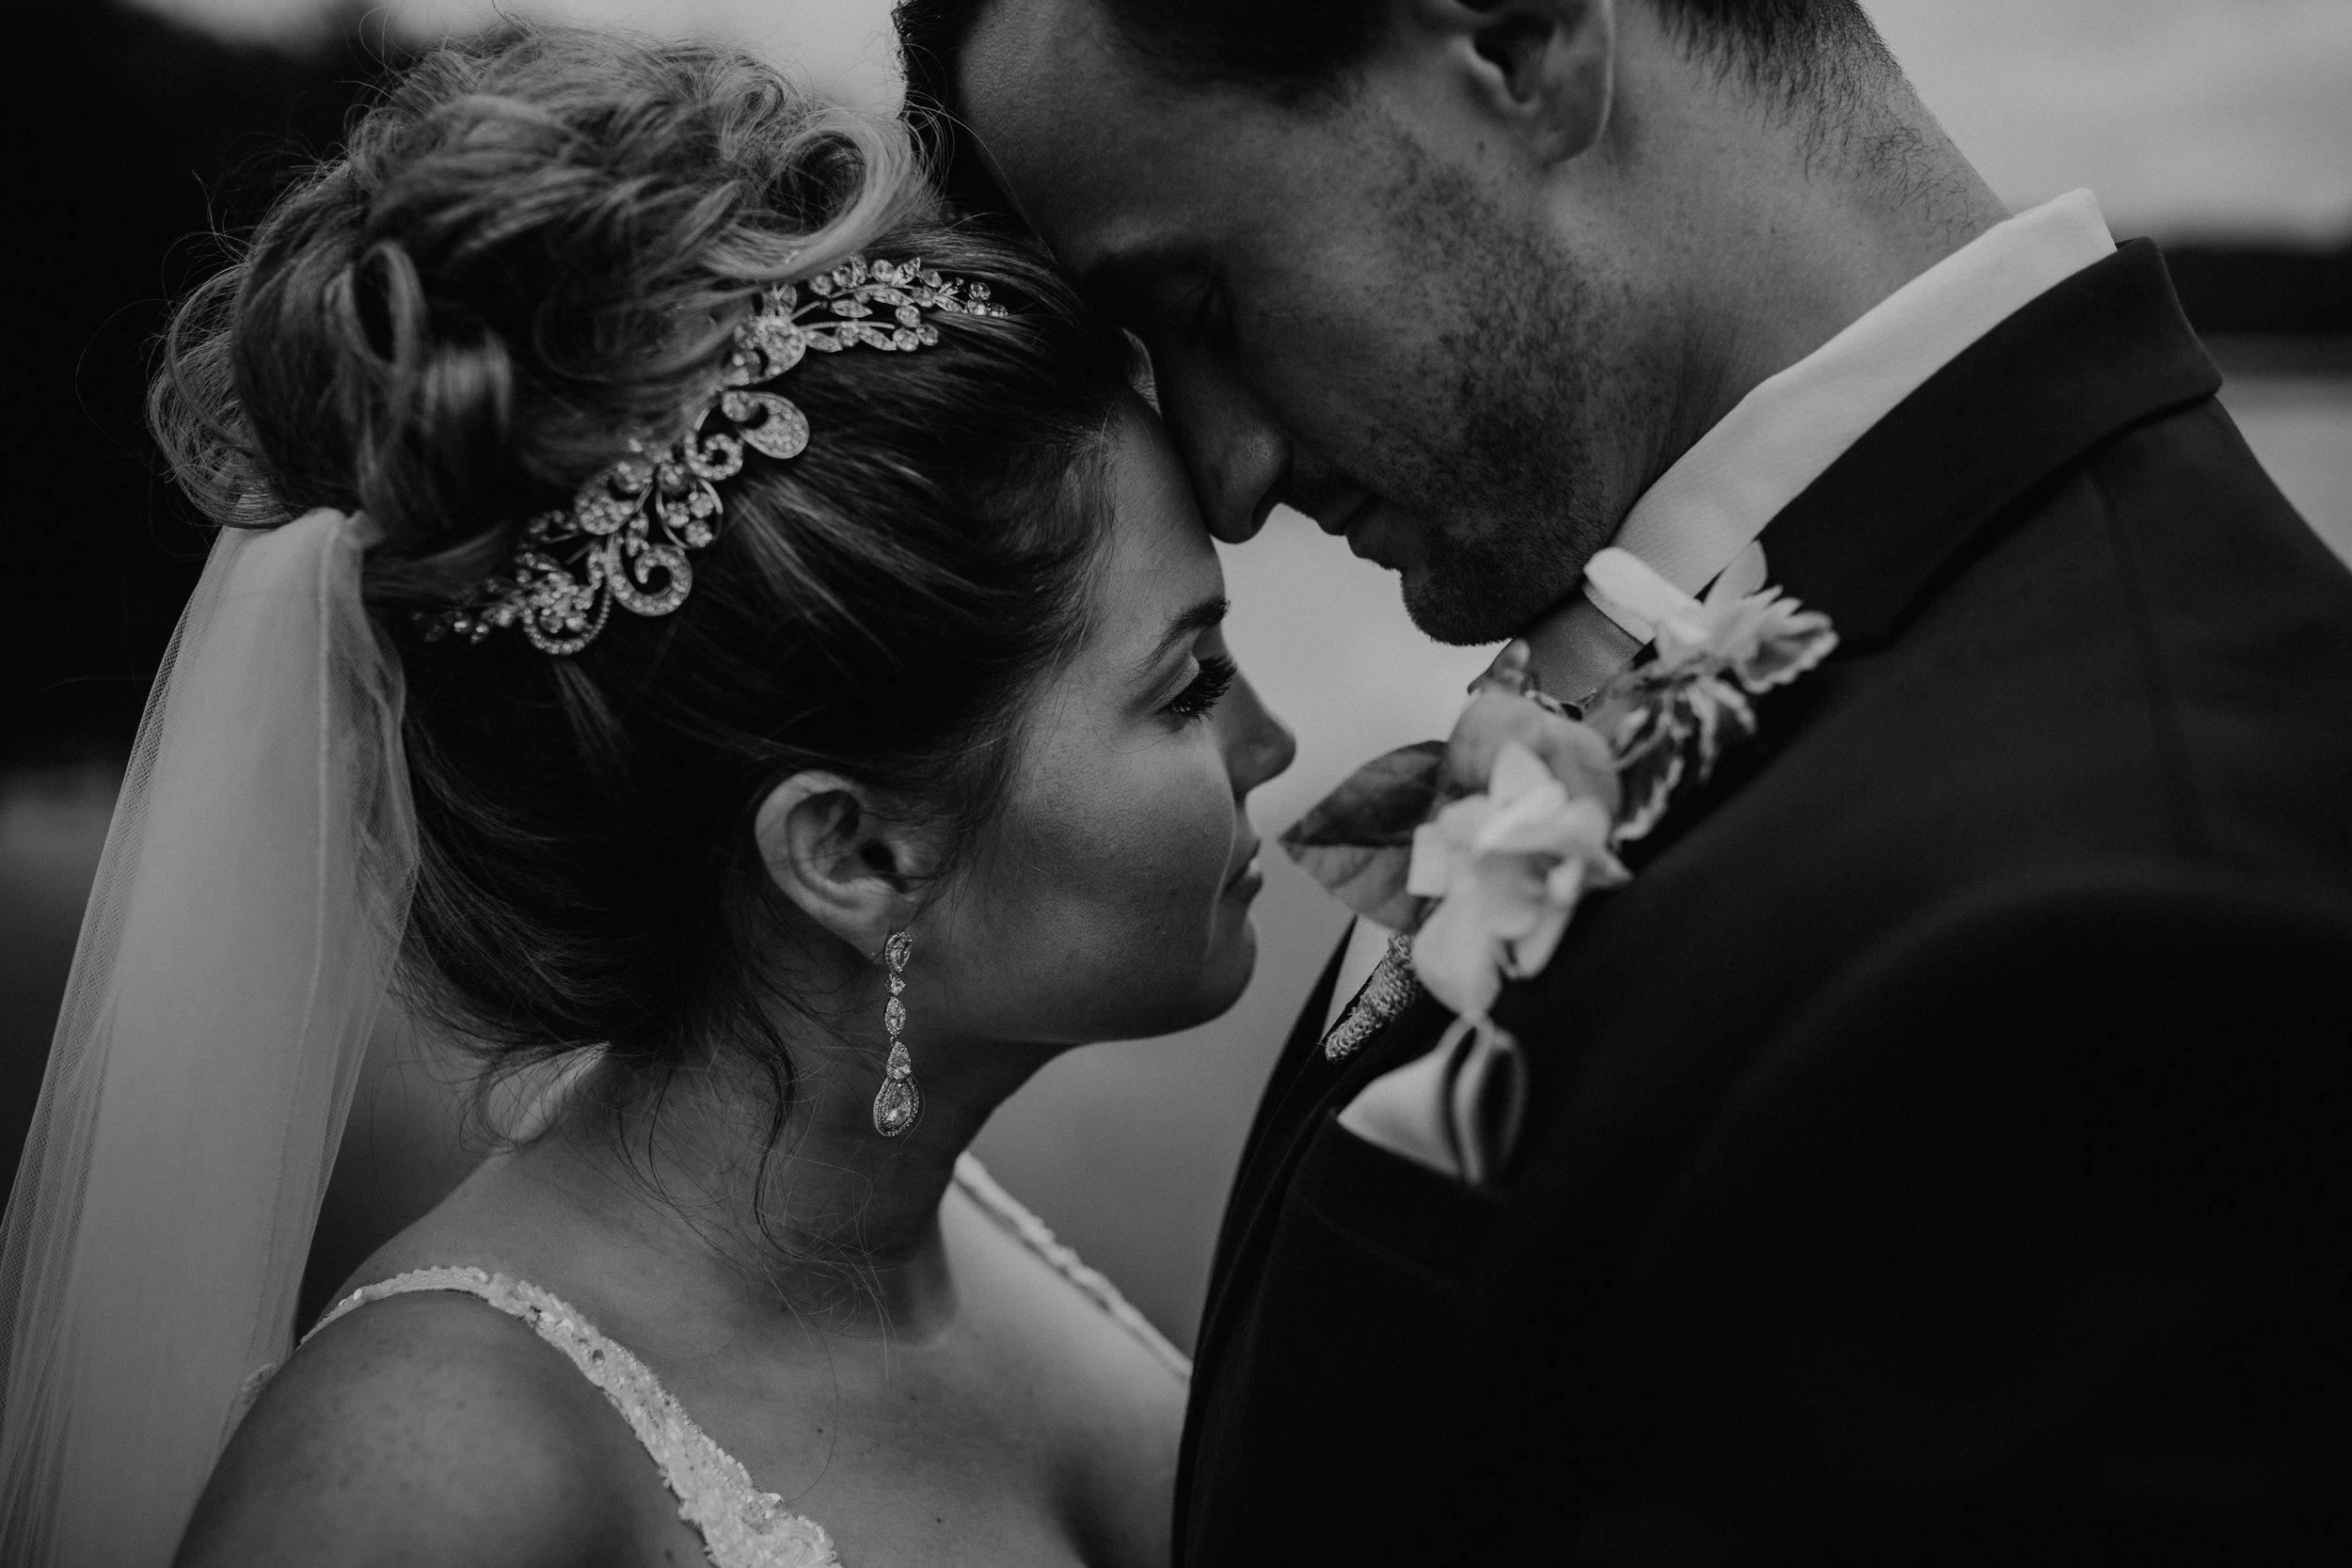 old_daley_on_crooked_lake_wedding_-71.jpg